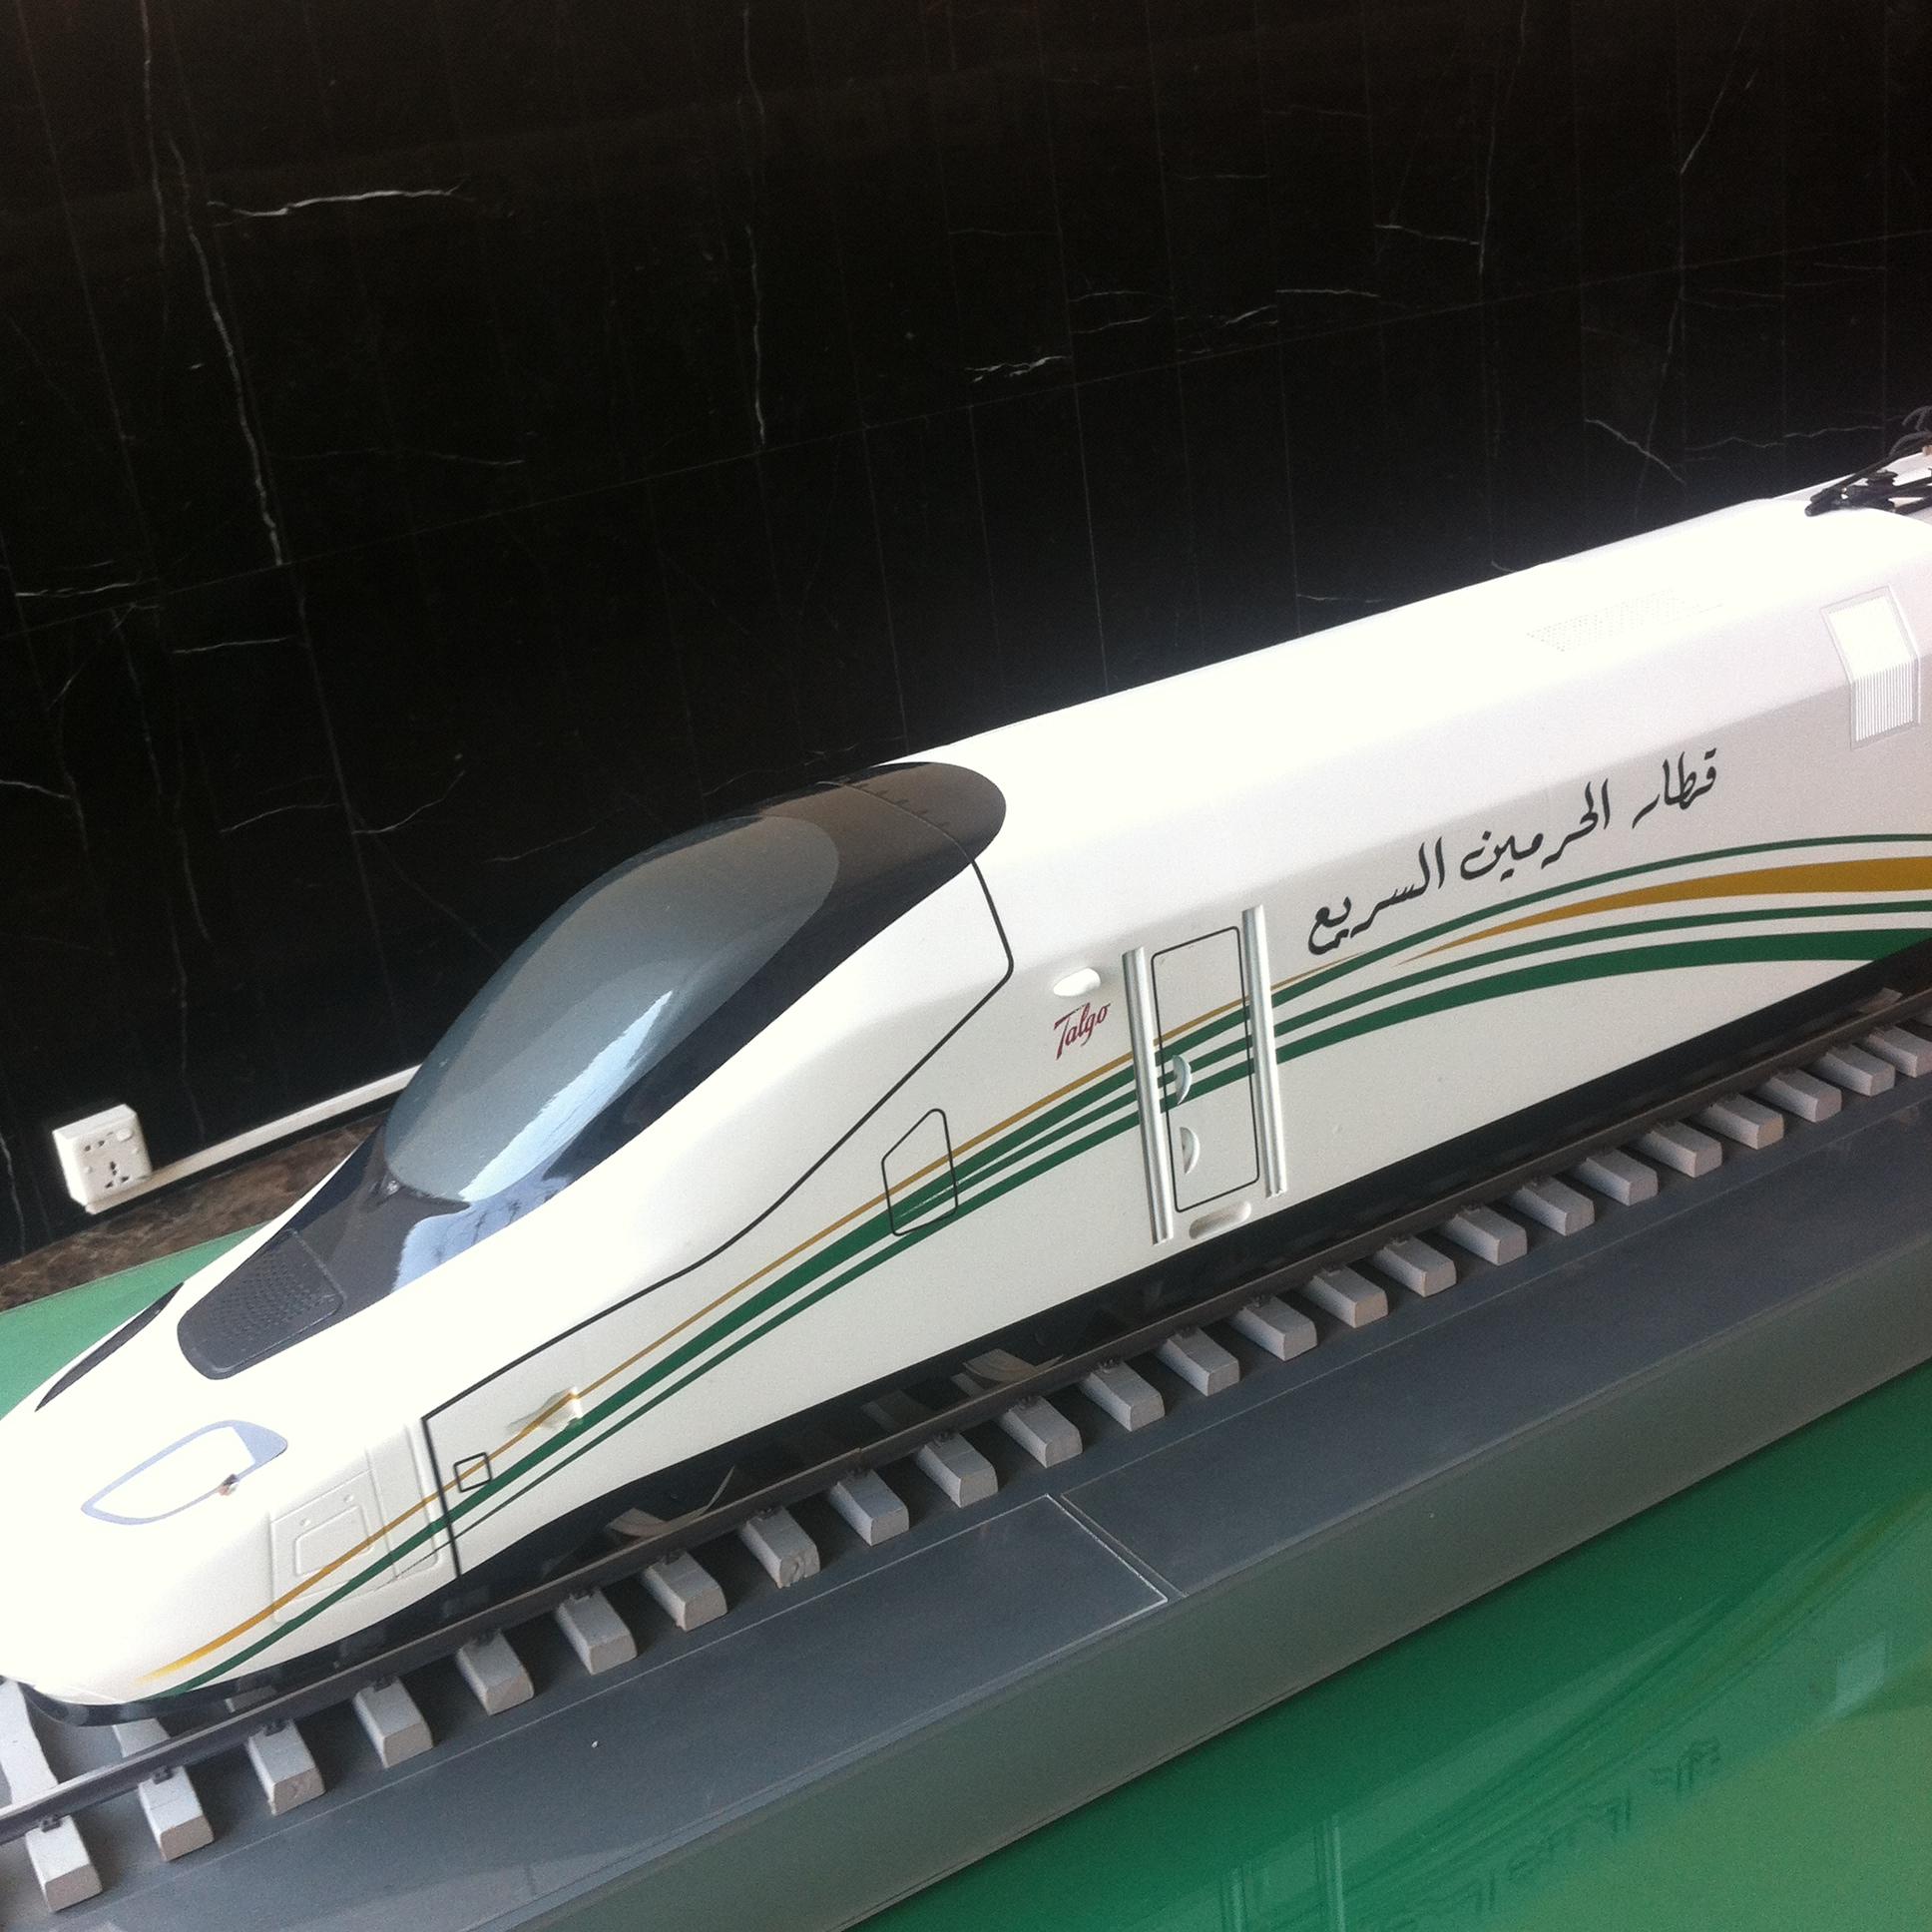 Haramain high speed railway train model.